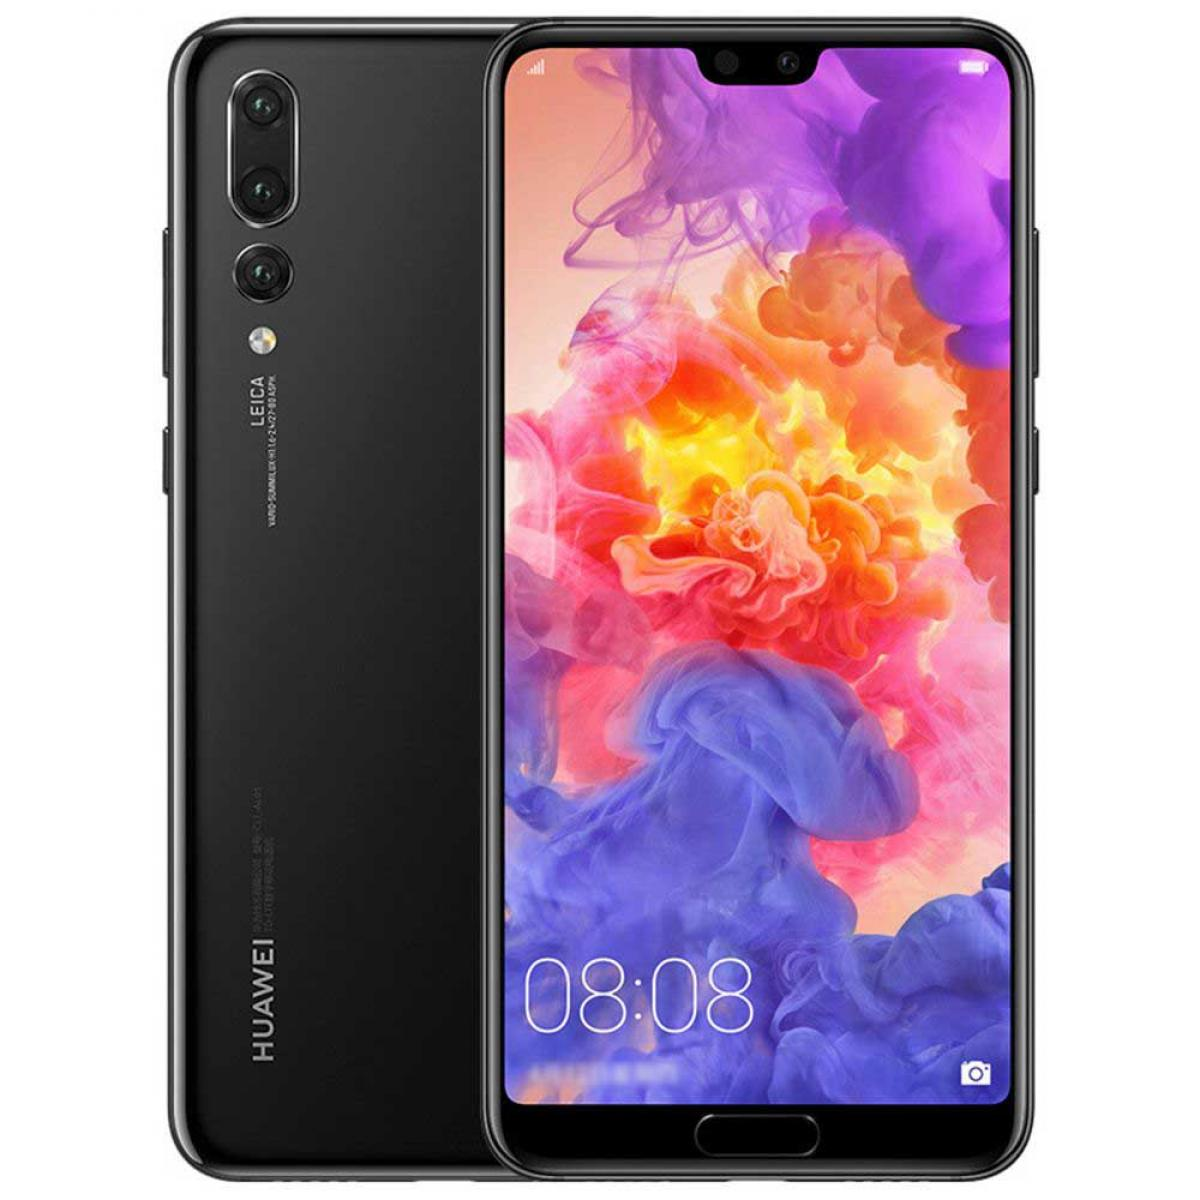 Mobile Phone Huawei P20 Pro | GTS - Amman Jordan | GTS - Amman Jordan